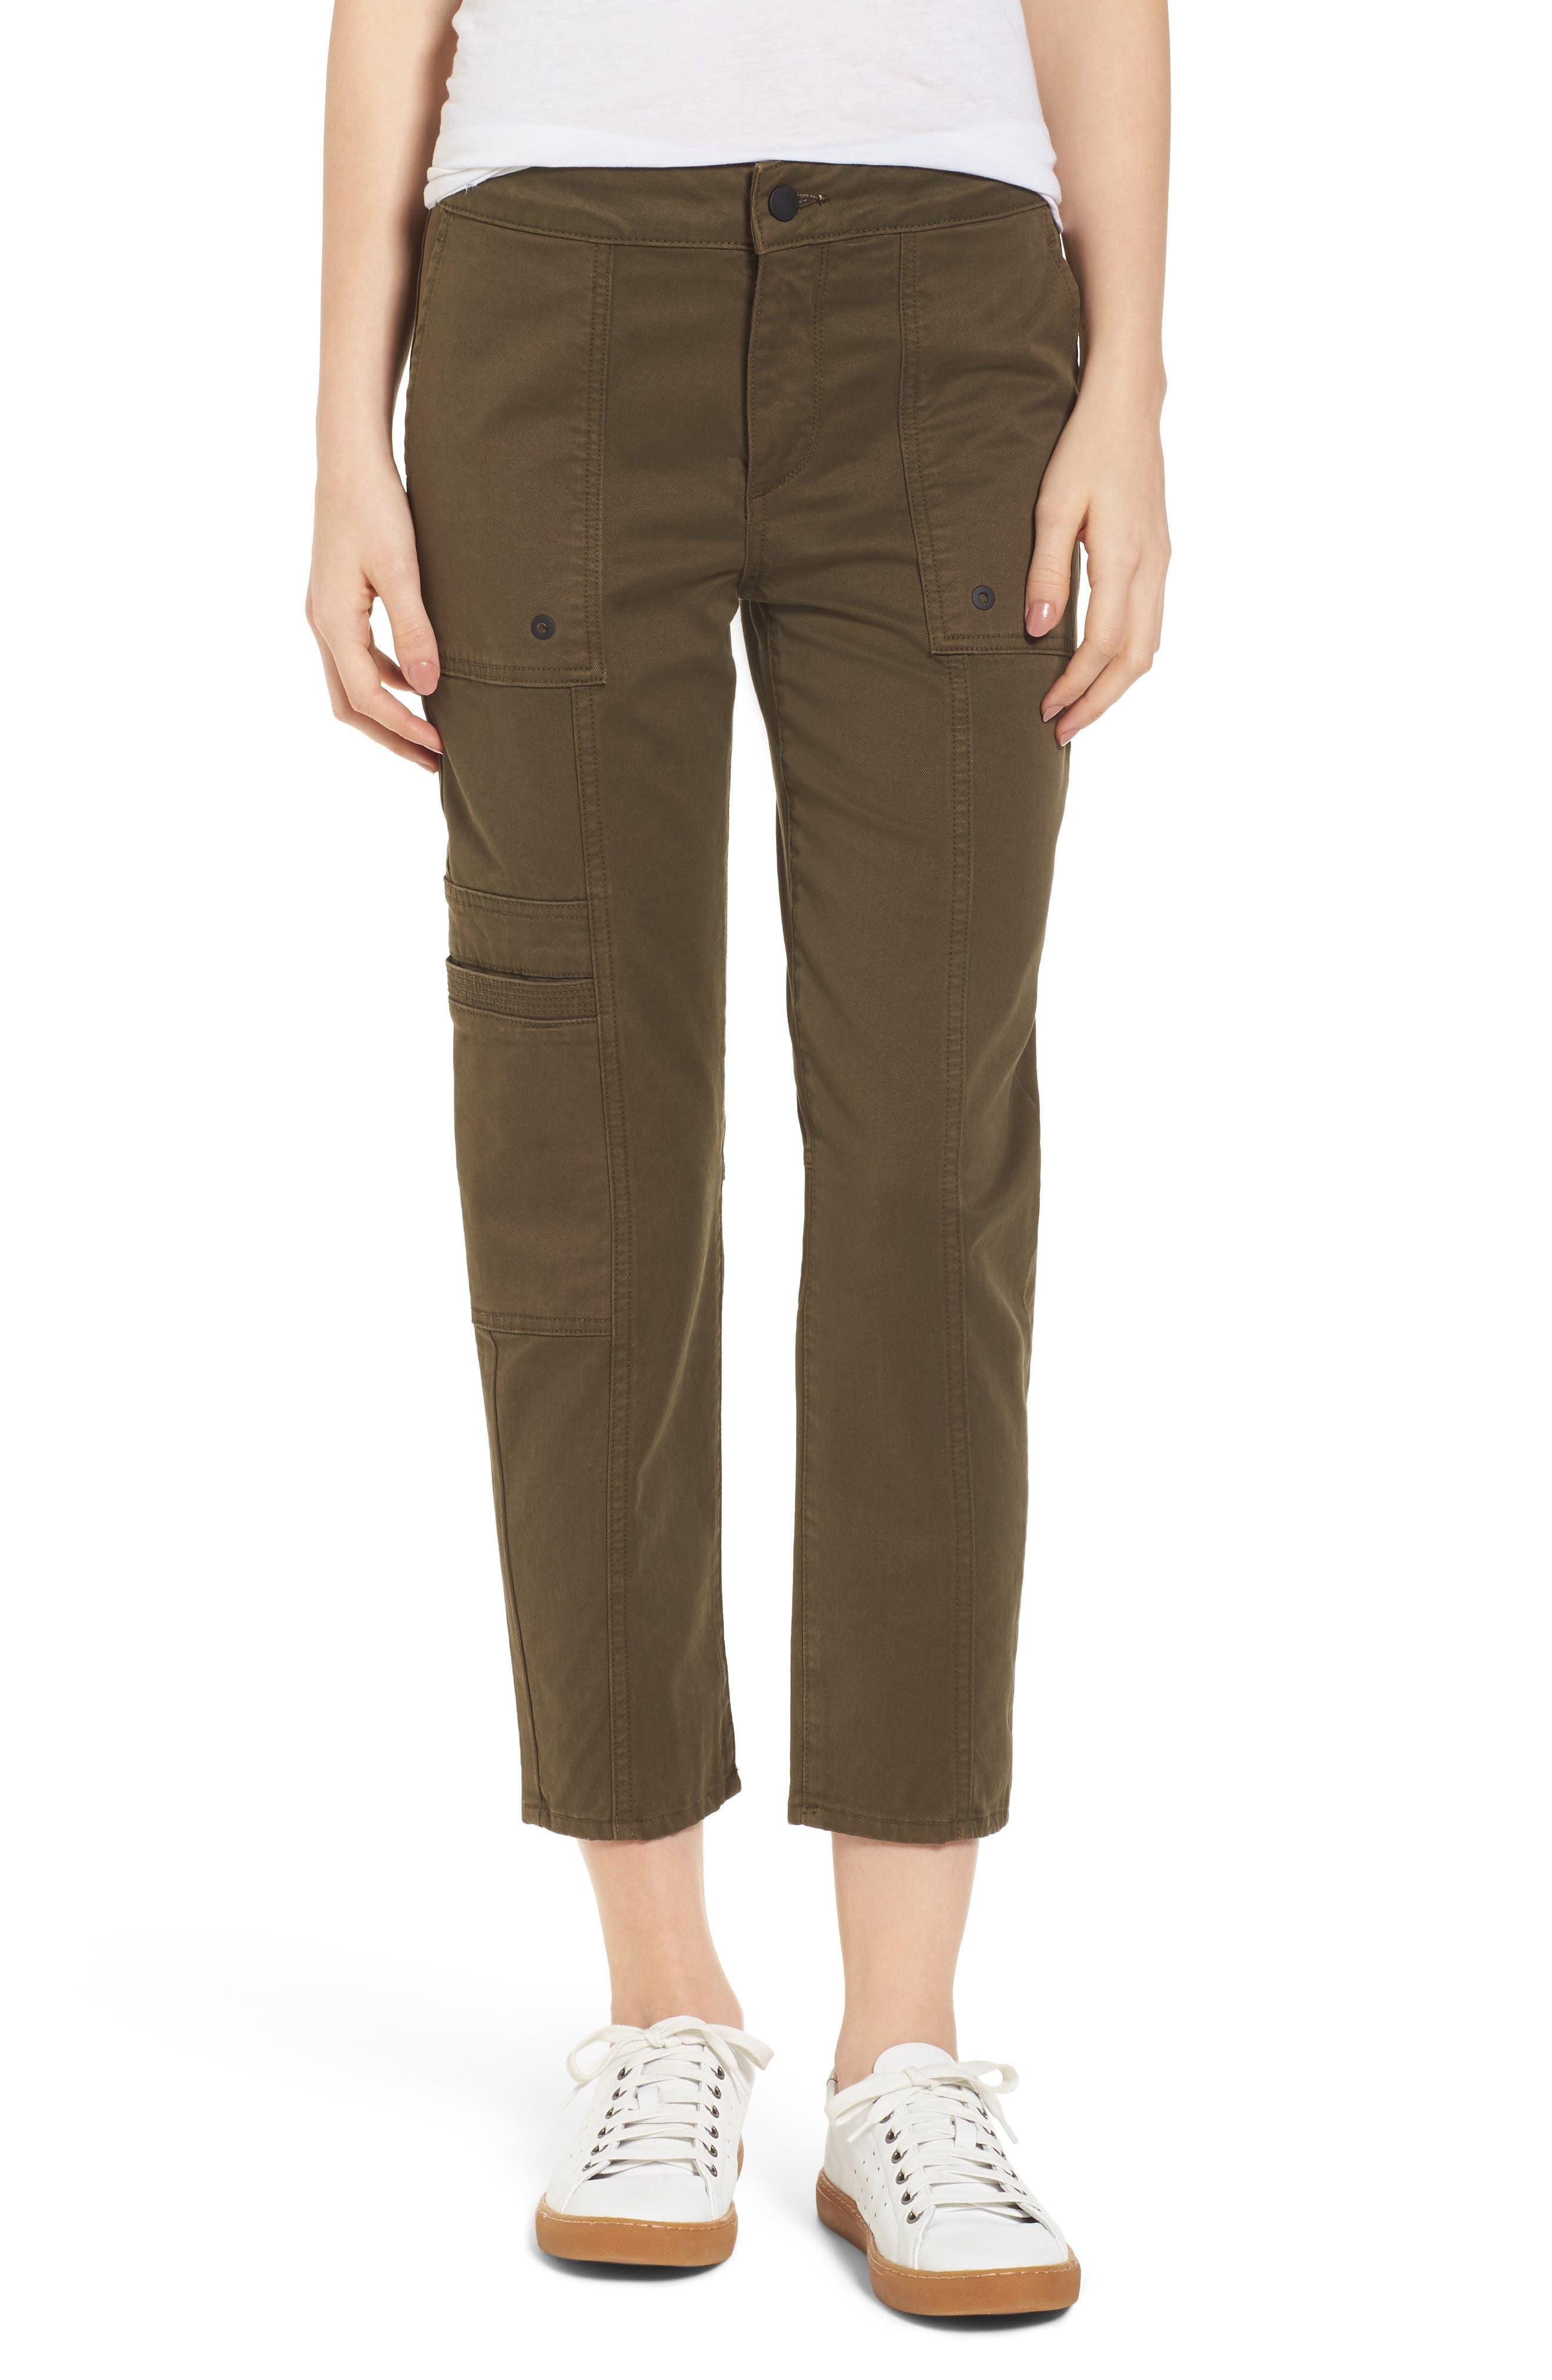 Elliot Slouchy Slim Cargo Pants,                         Main,                         color, Driftless